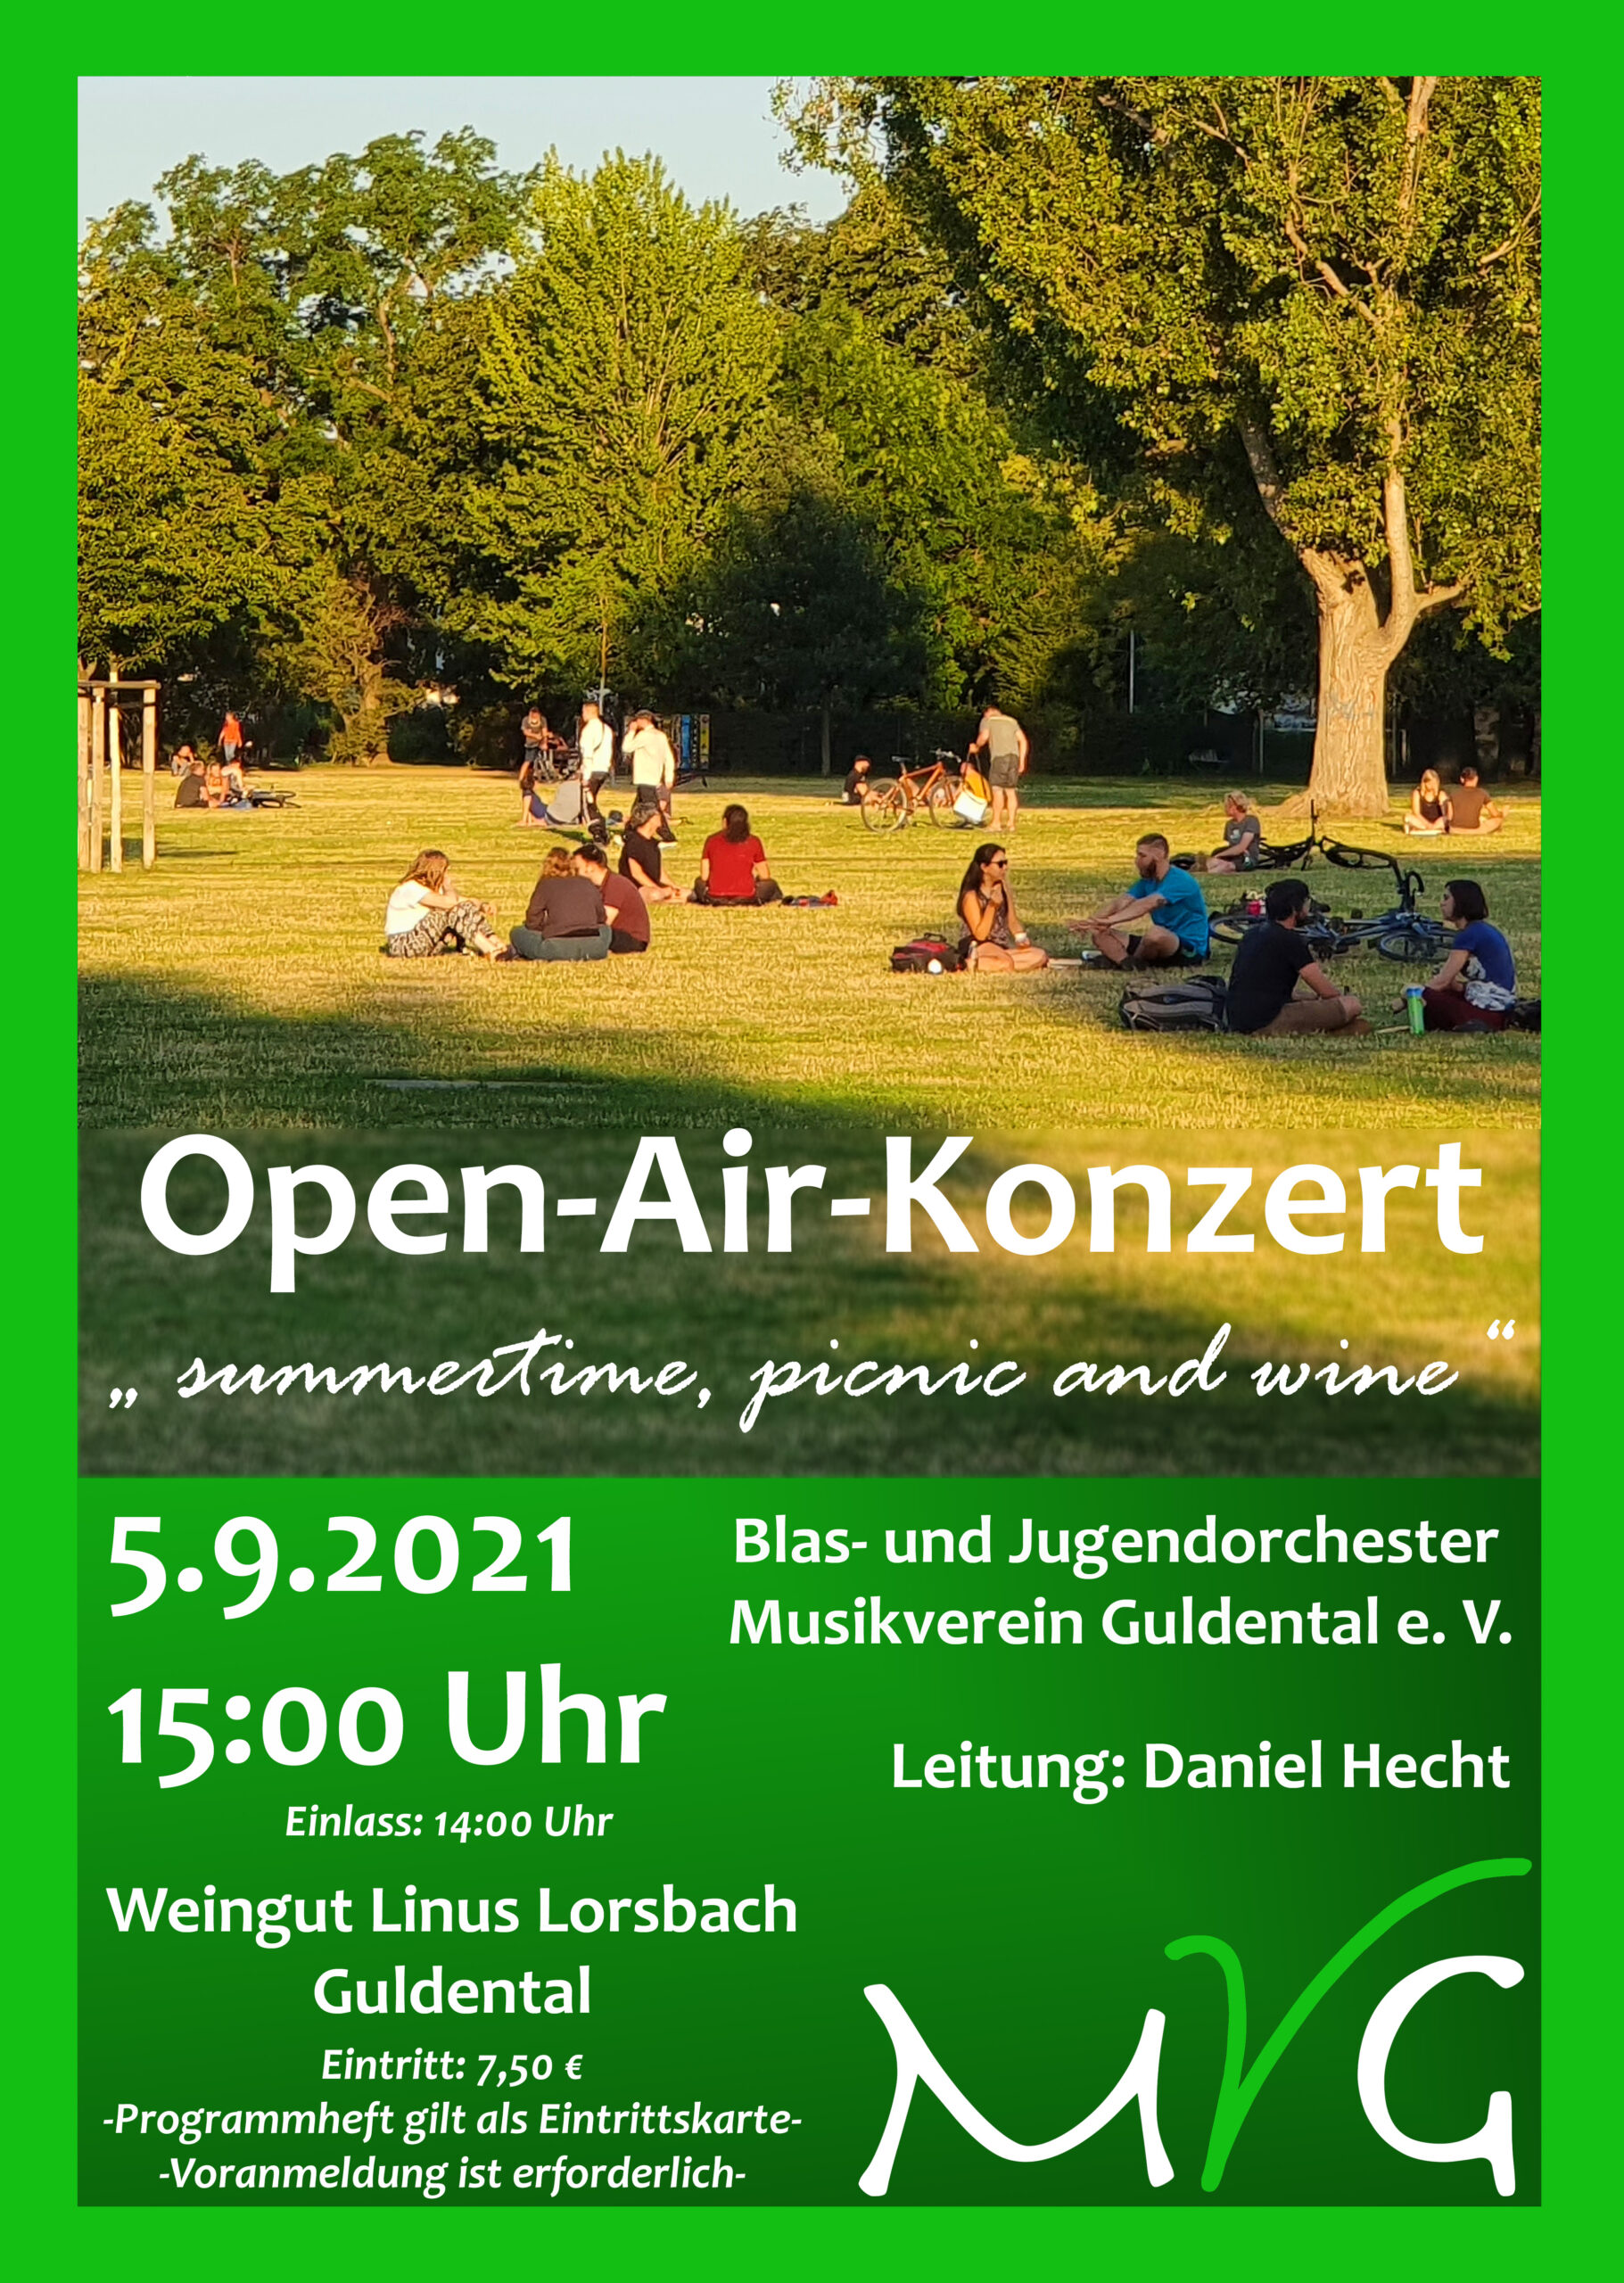 "Jetzt reservieren: OPENAIR-Konzert des Musikverein Guldental ""summertime, picnic and wine"" – 5. September 2021 – 15.00 Uhr"